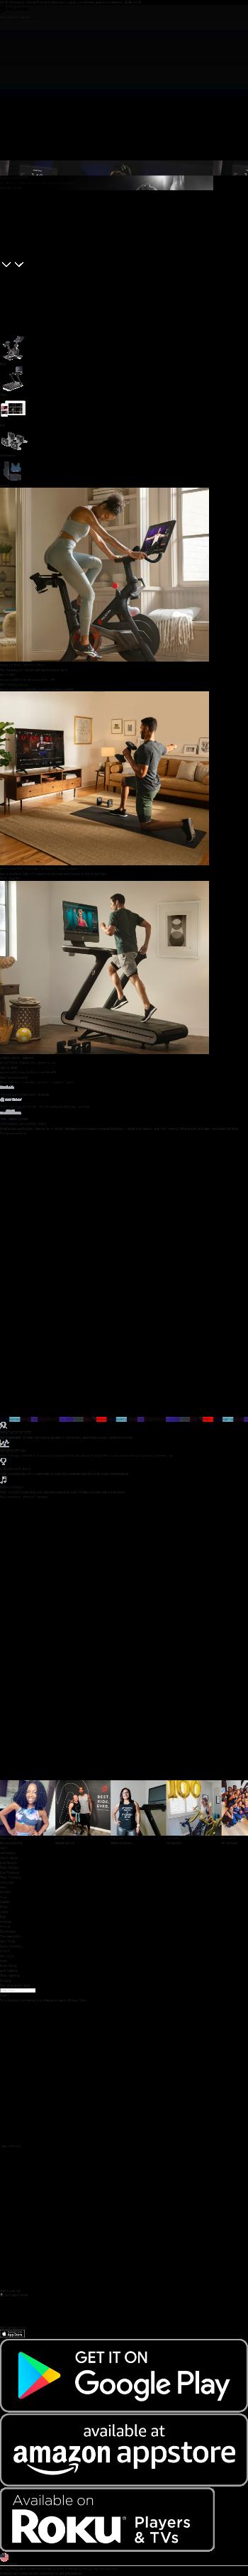 Peloton Interactive, Inc. Website Screenshot